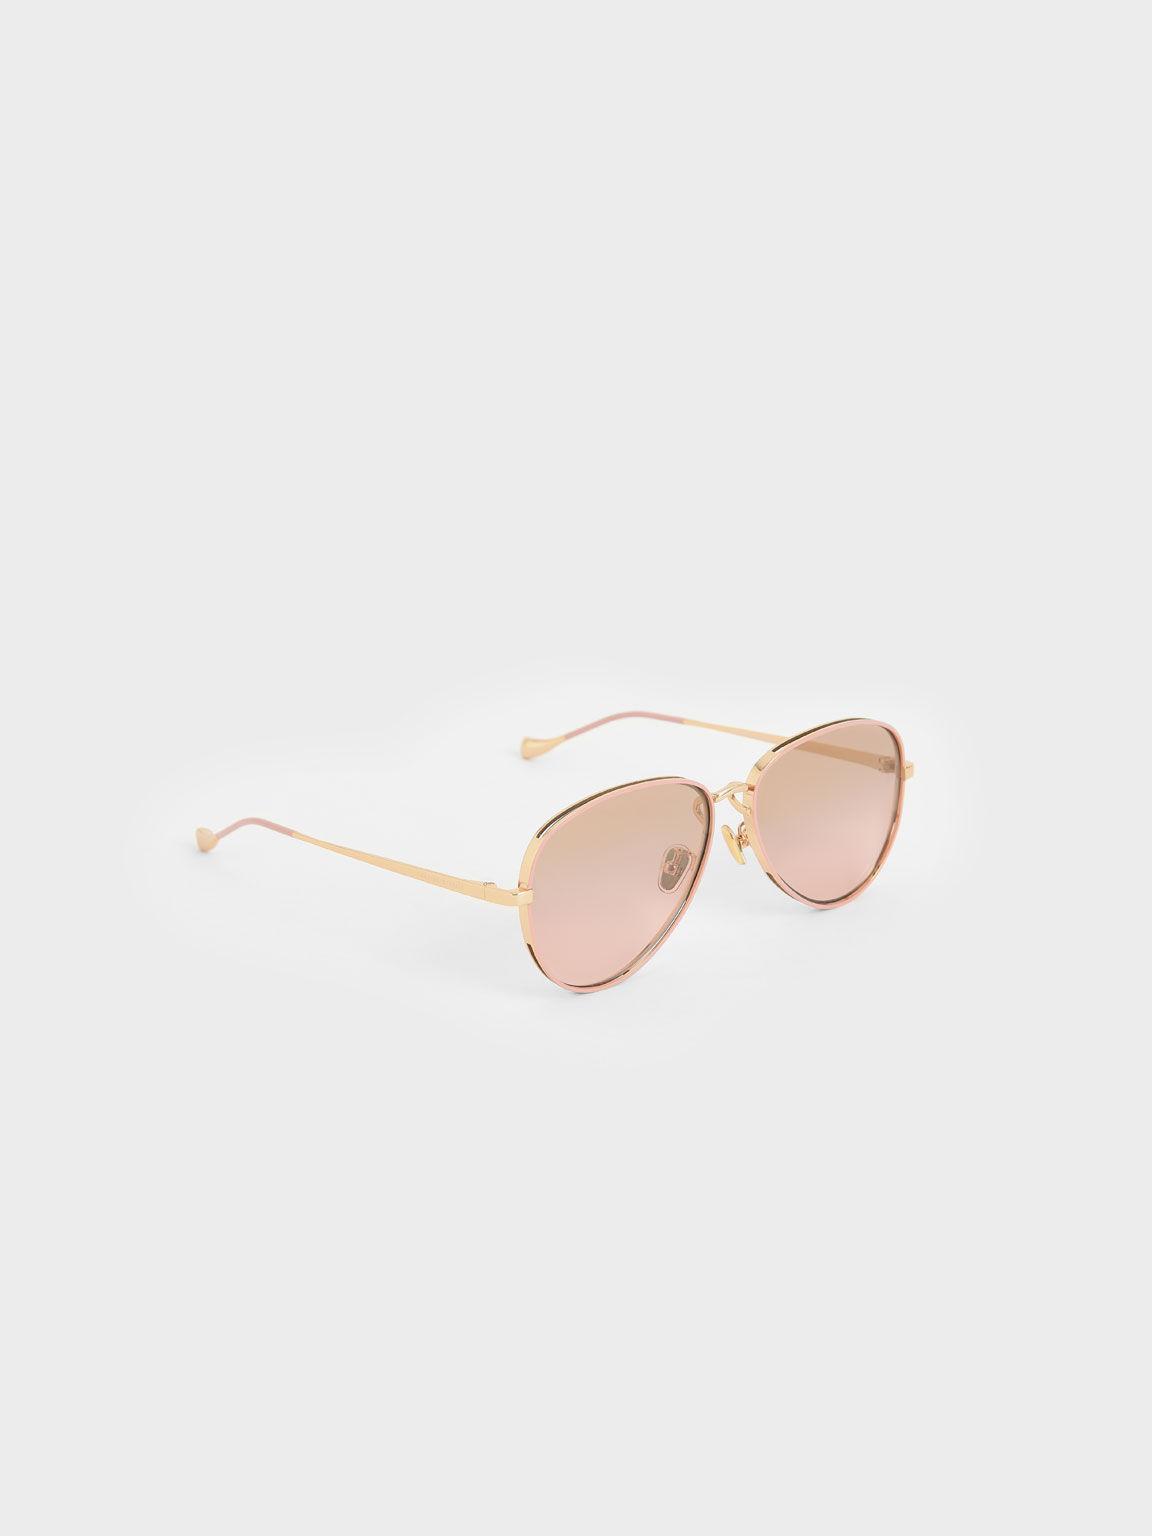 Tinted Aviator Sunglasses, Pink, hi-res